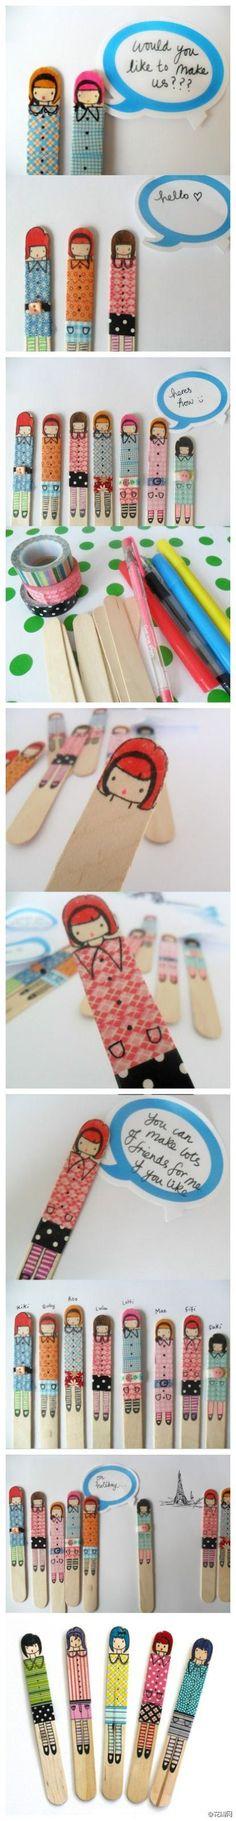 DIY popsicle stick dolls